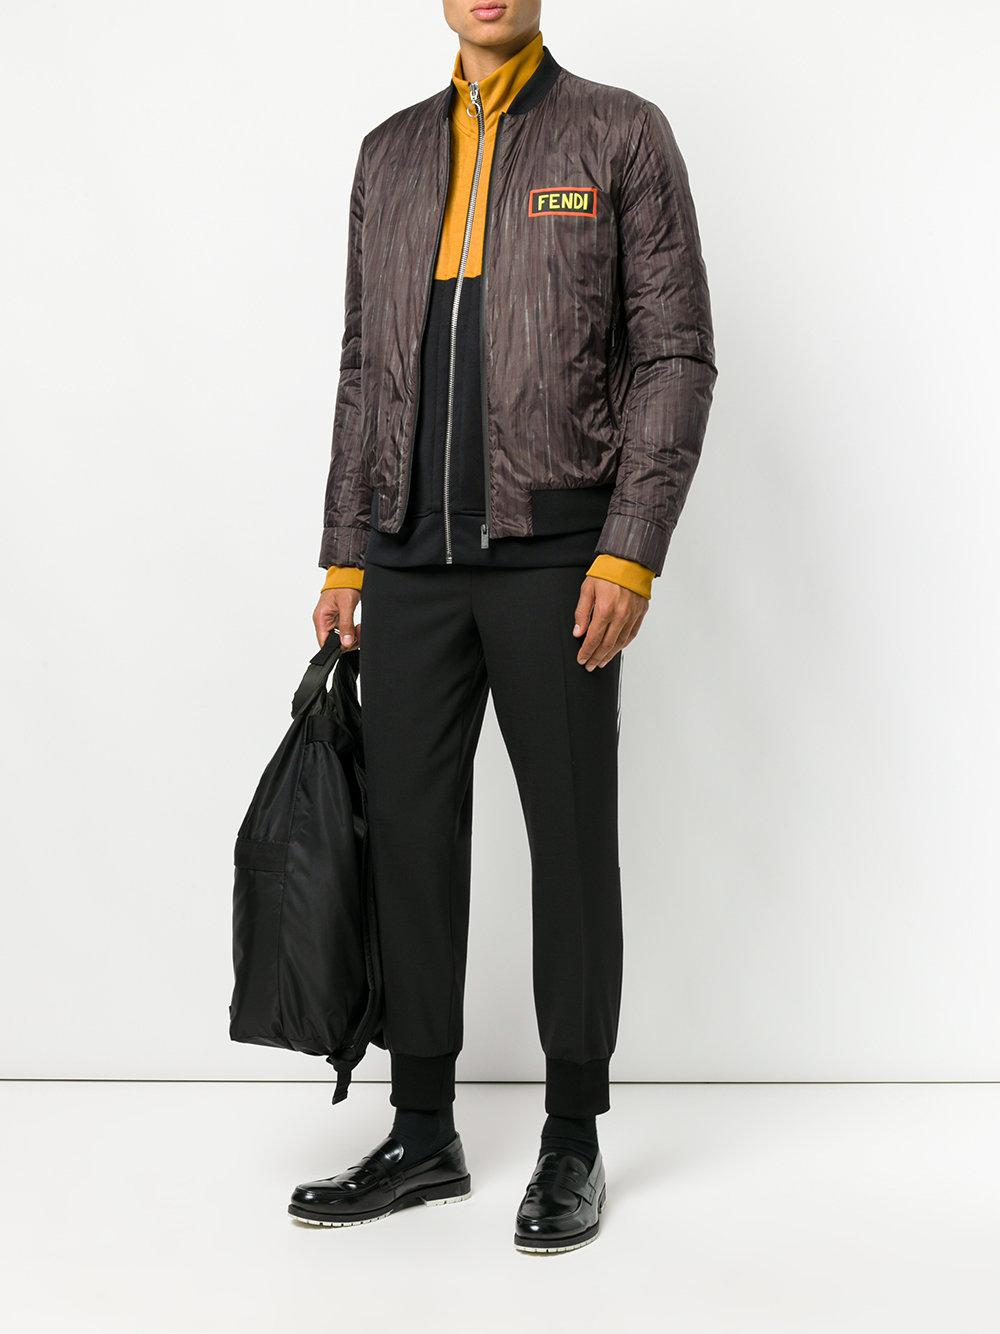 Fendi Synthetic Logo Print Bomber Jacket for Men